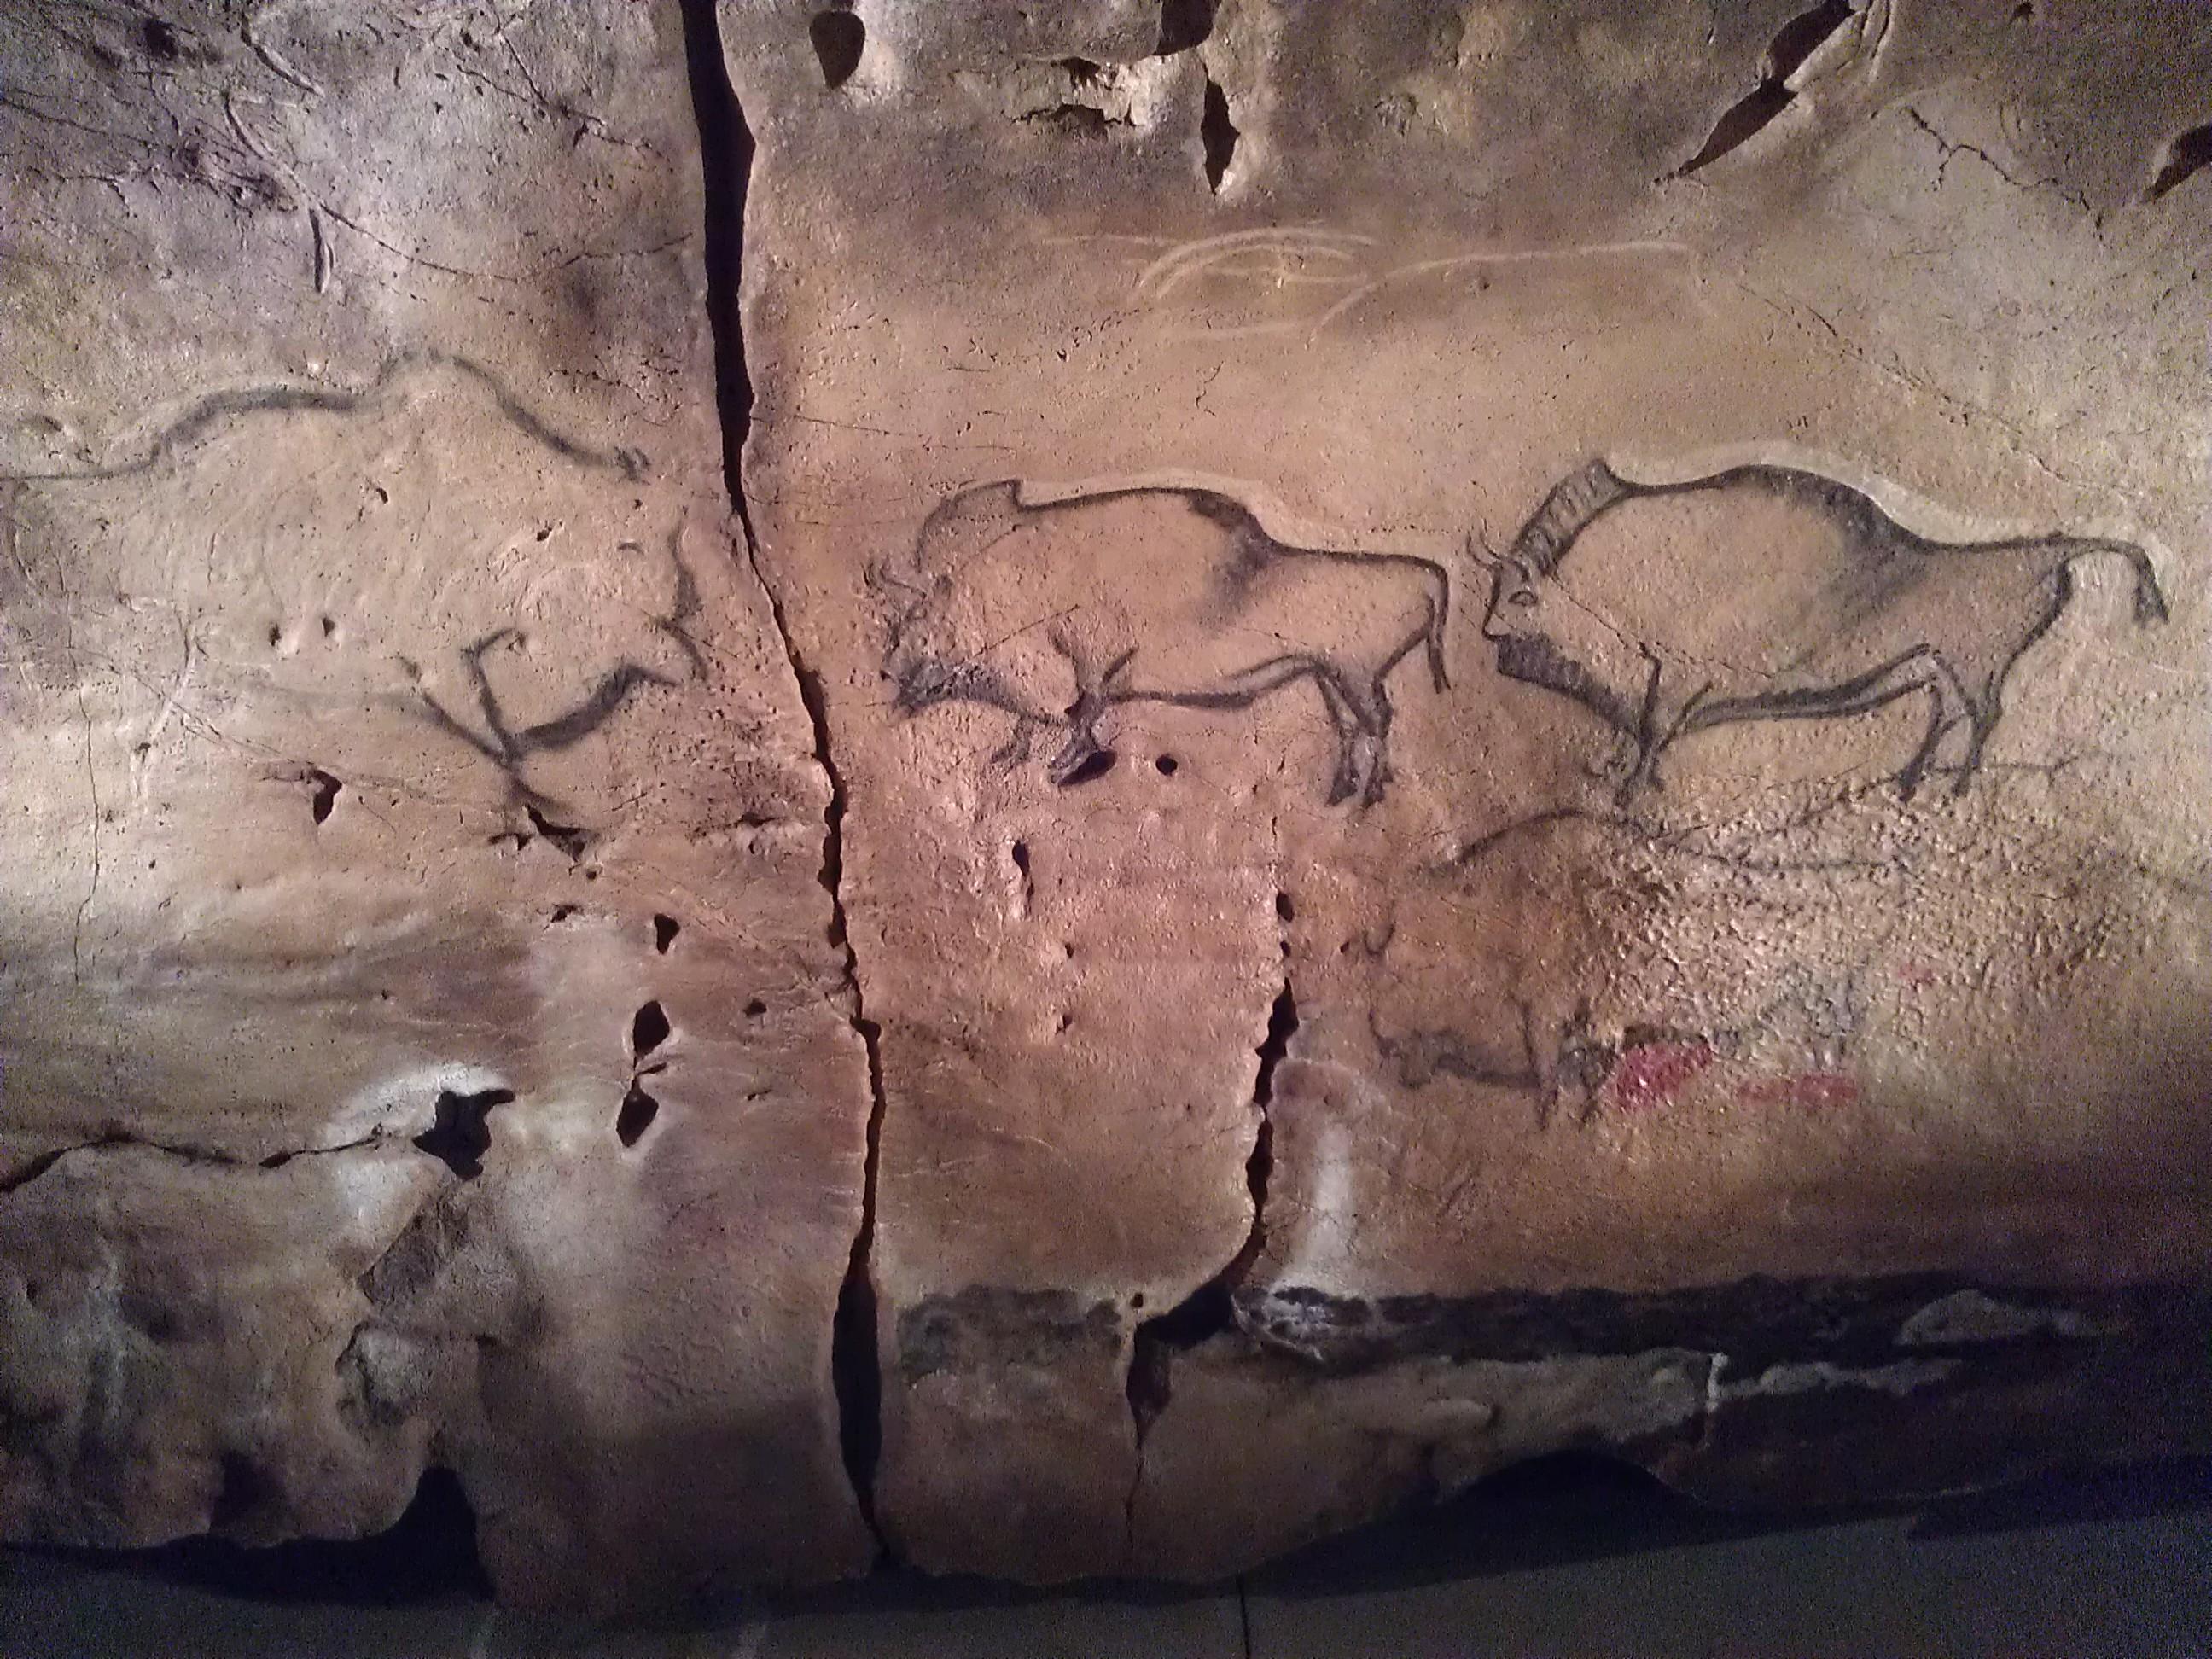 pinturas prehistoricas